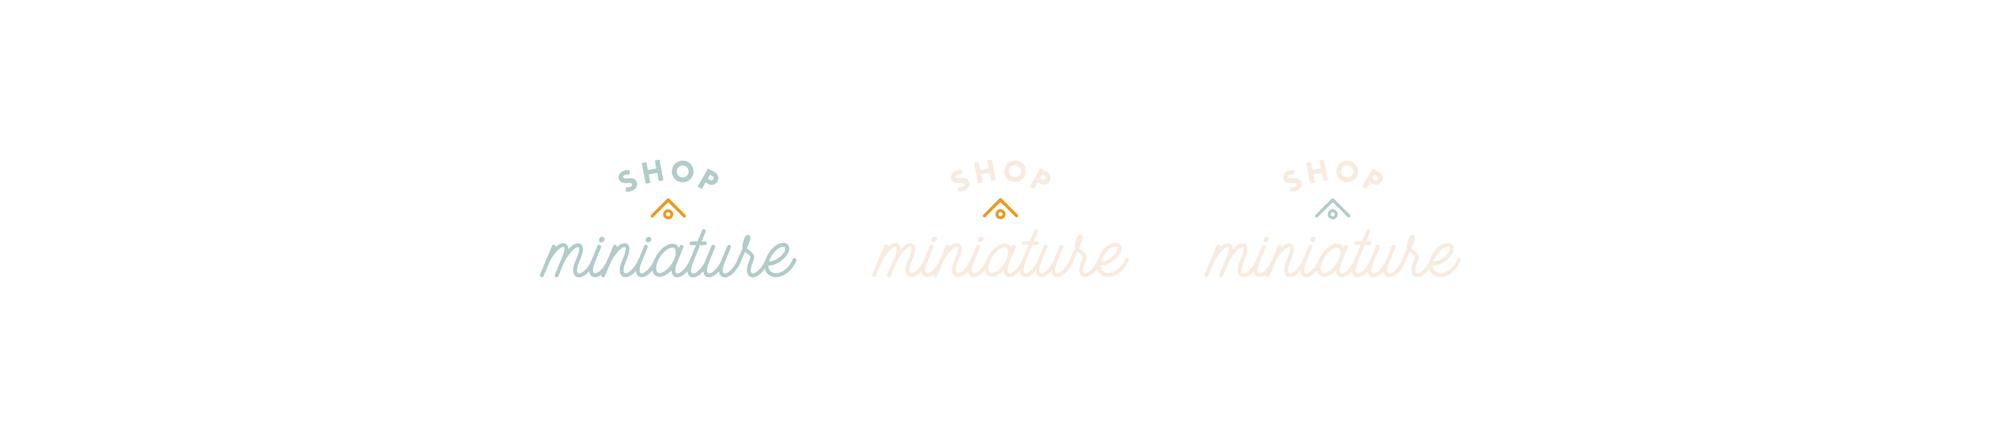 shopmini2.jpg